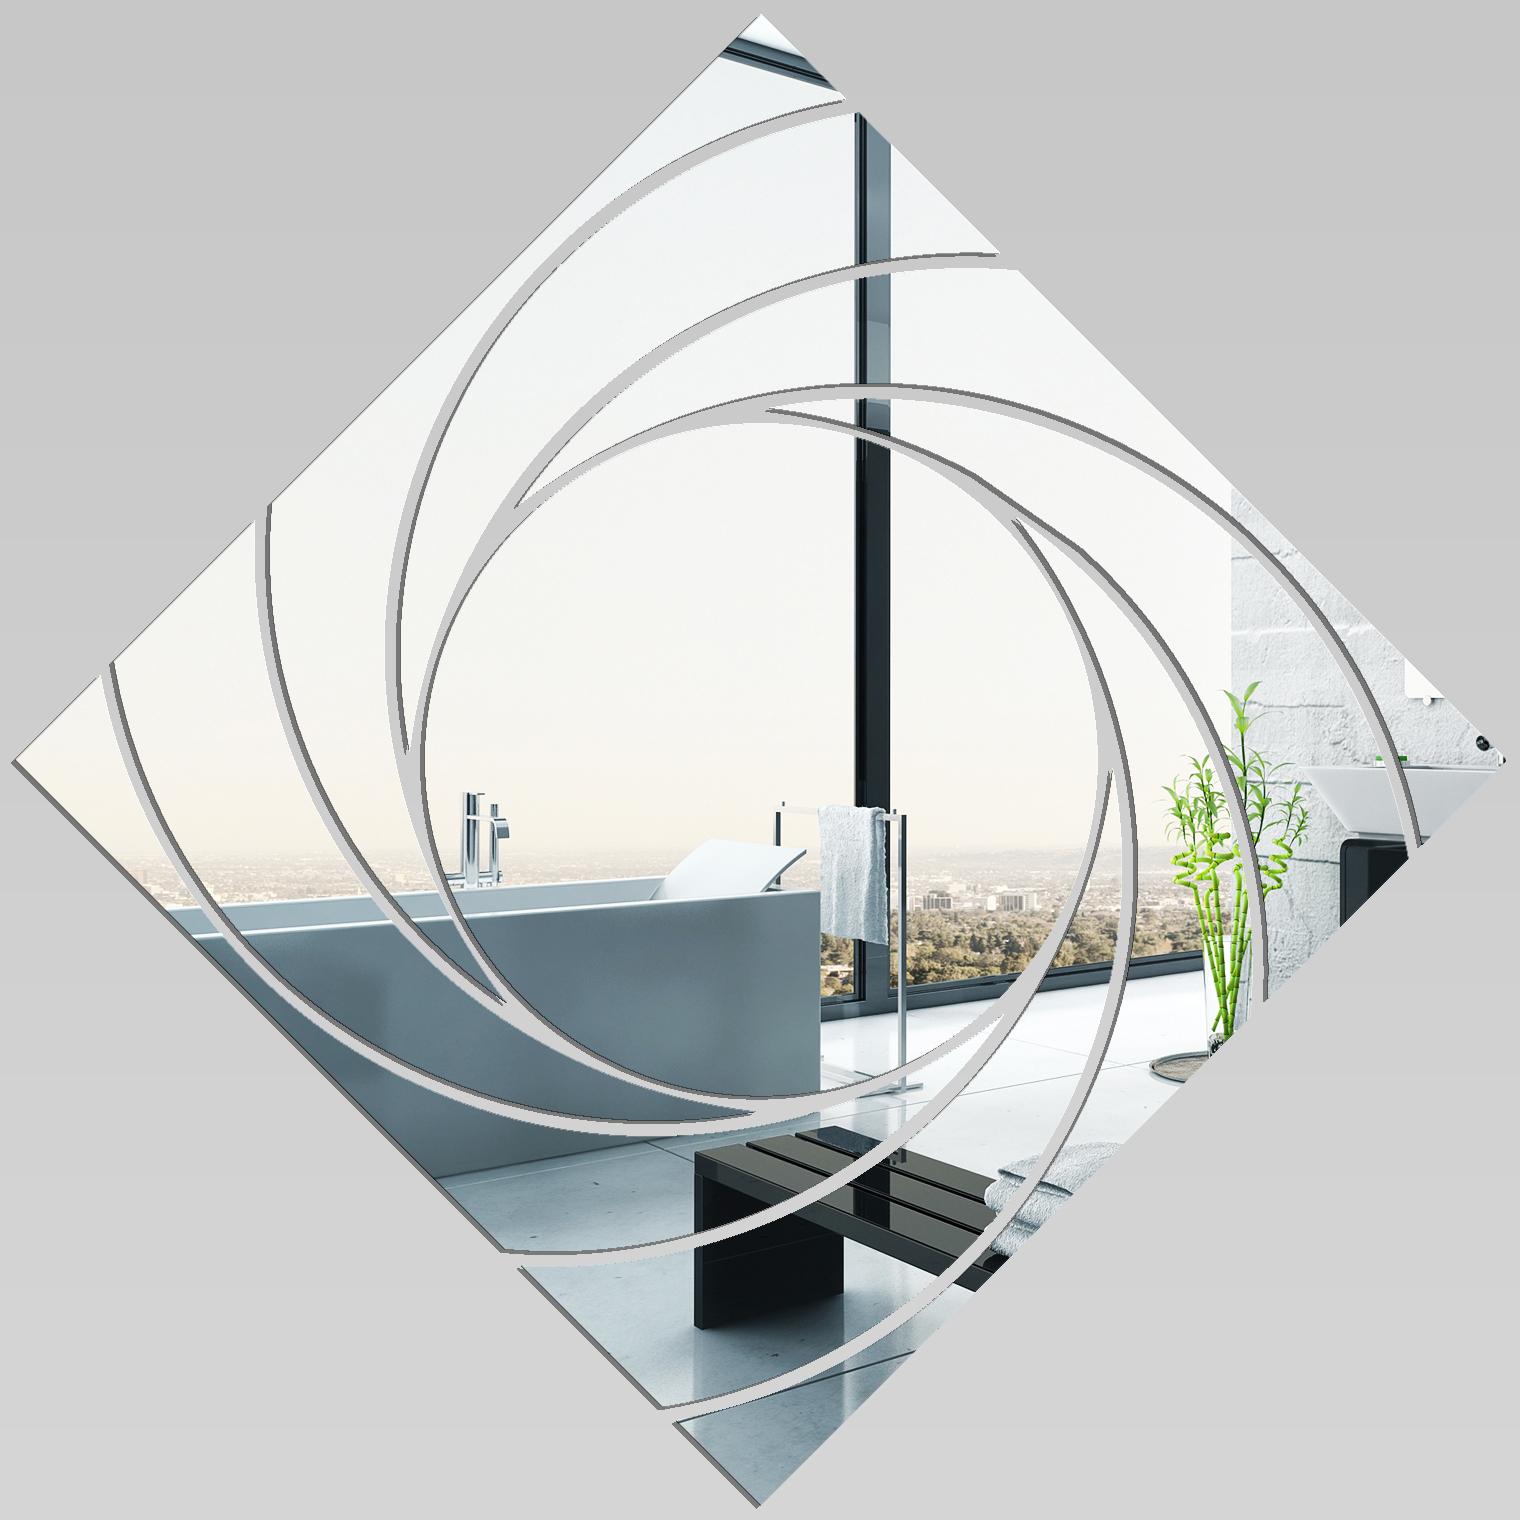 Miroir plexiglass acrylique carr spirales 2 pas cher for Miroir 100x100